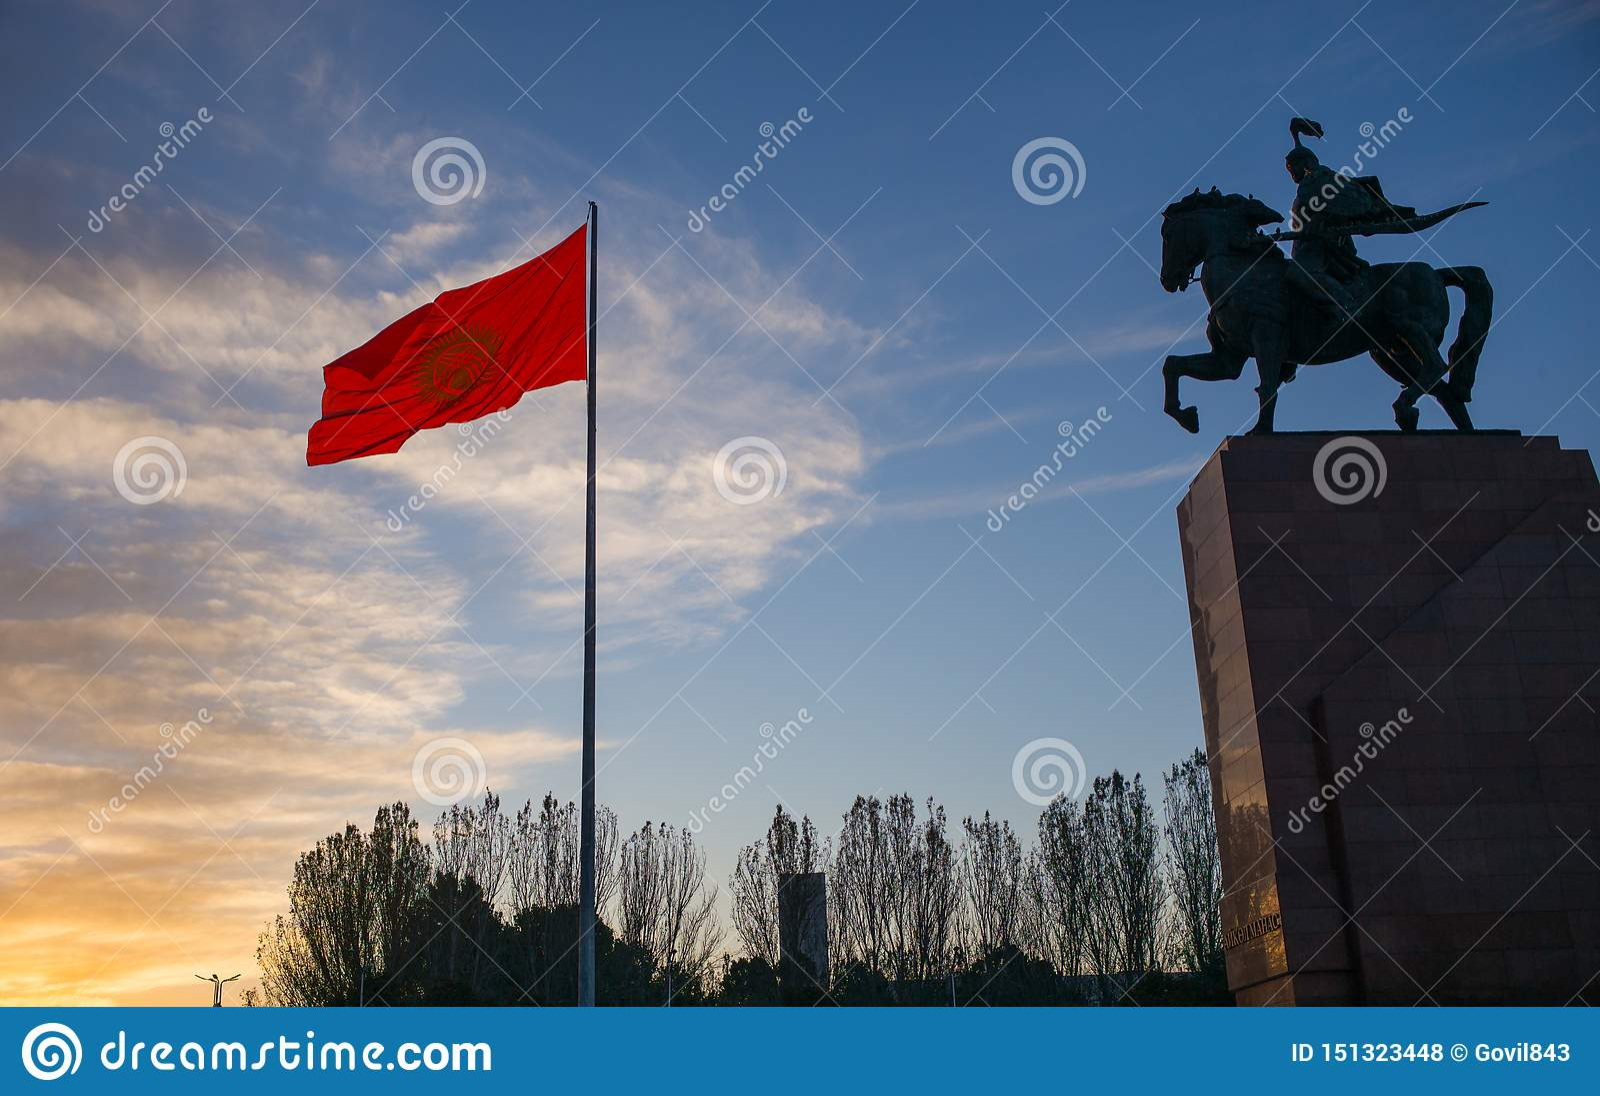 Bishkek, Kirgistan: Zabytek dla Manas, bohater antyczne kyrgyz epopeje wraz z obywatela Kirgistan flagą na Bishkek centrali Al,